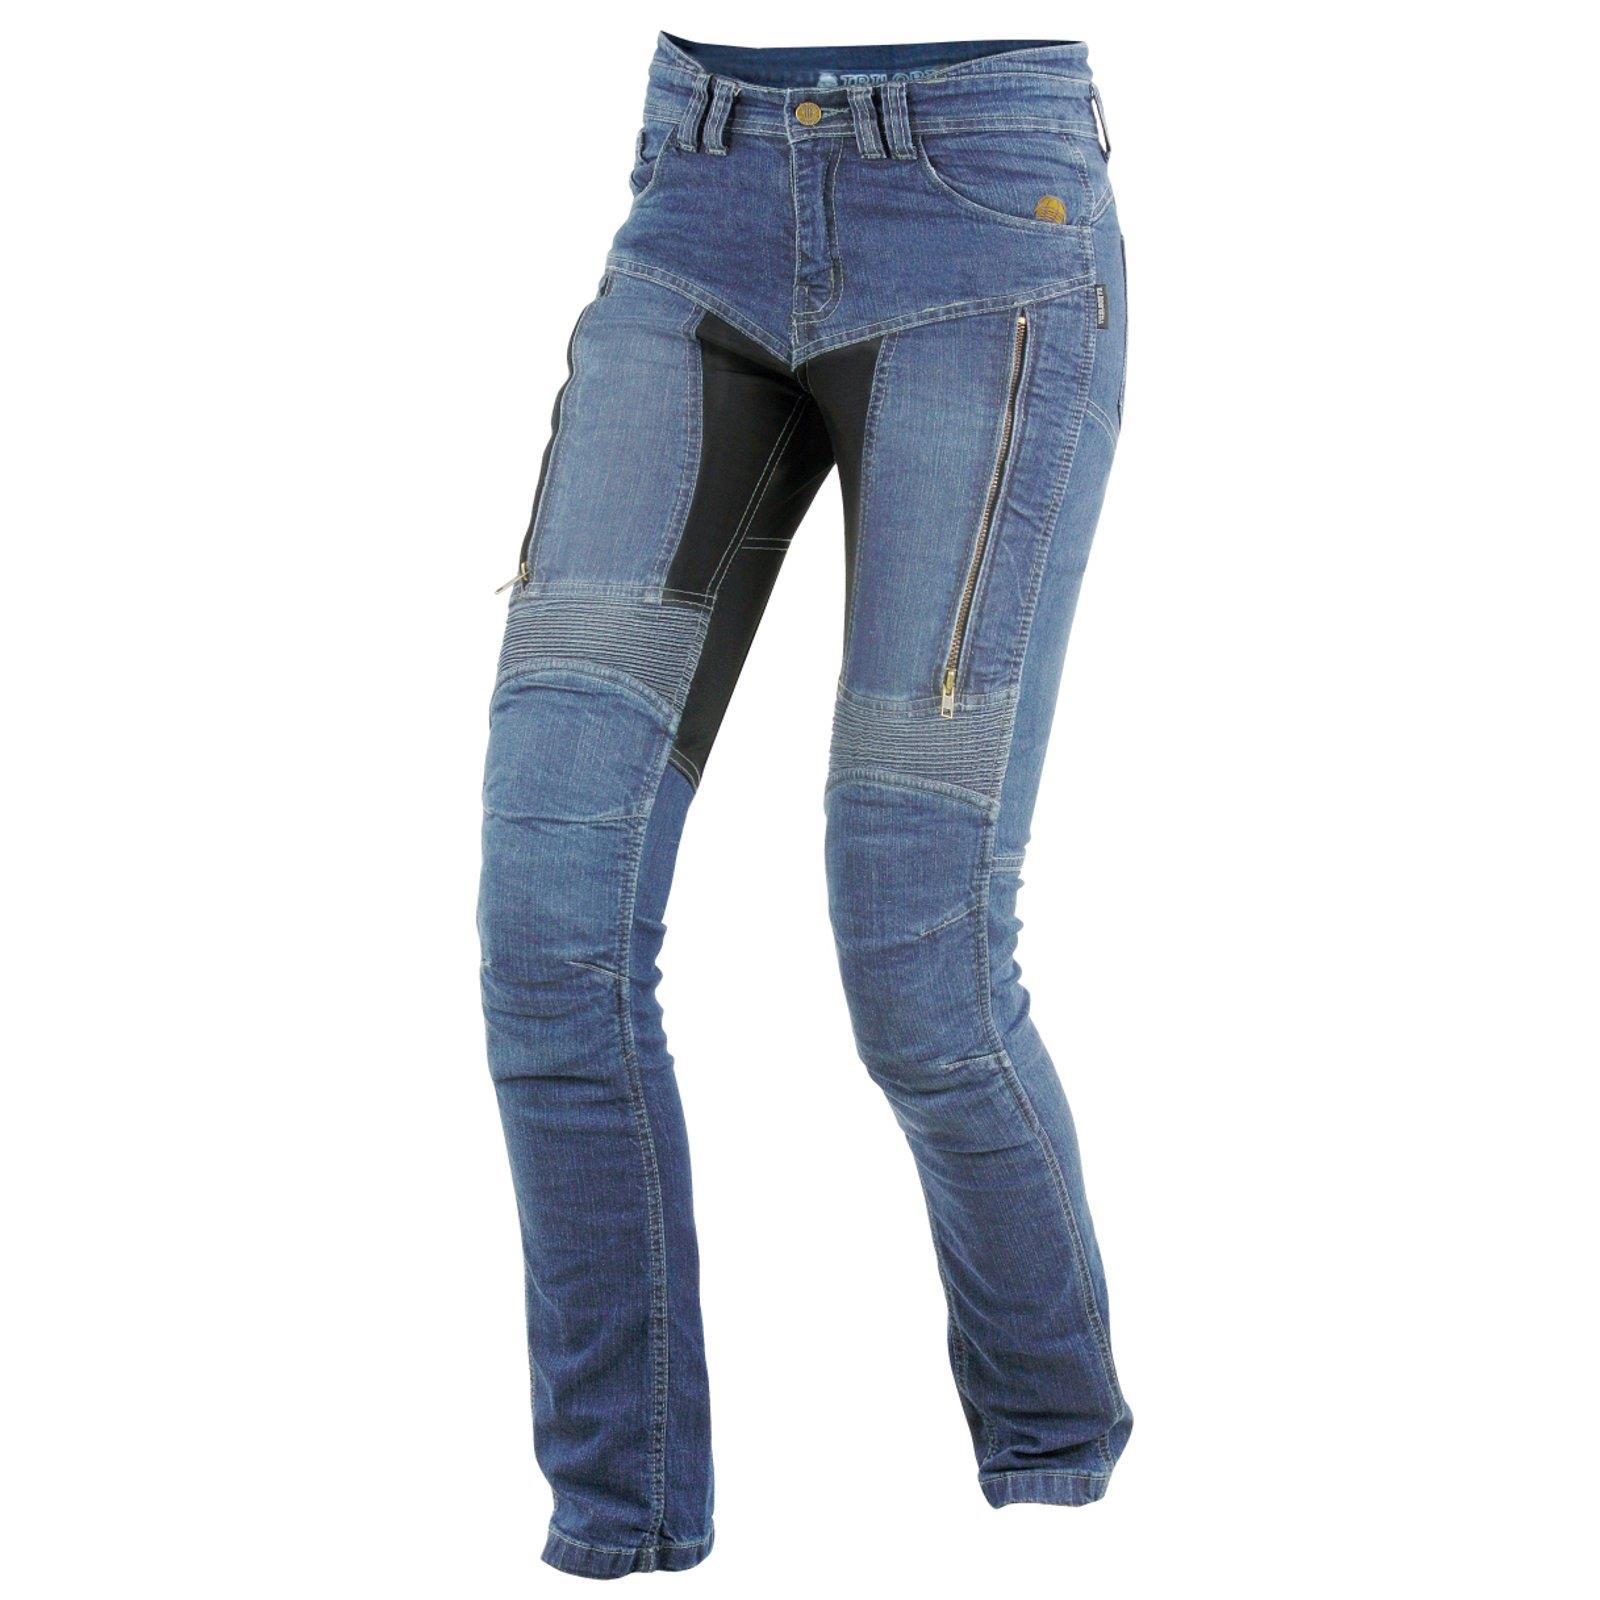 Trilobite-Pantaloni-Moto-Jeans-Abbigliamento-Parado-MICAS-URBAN-DUAL-PANTS-ACID miniatura 67